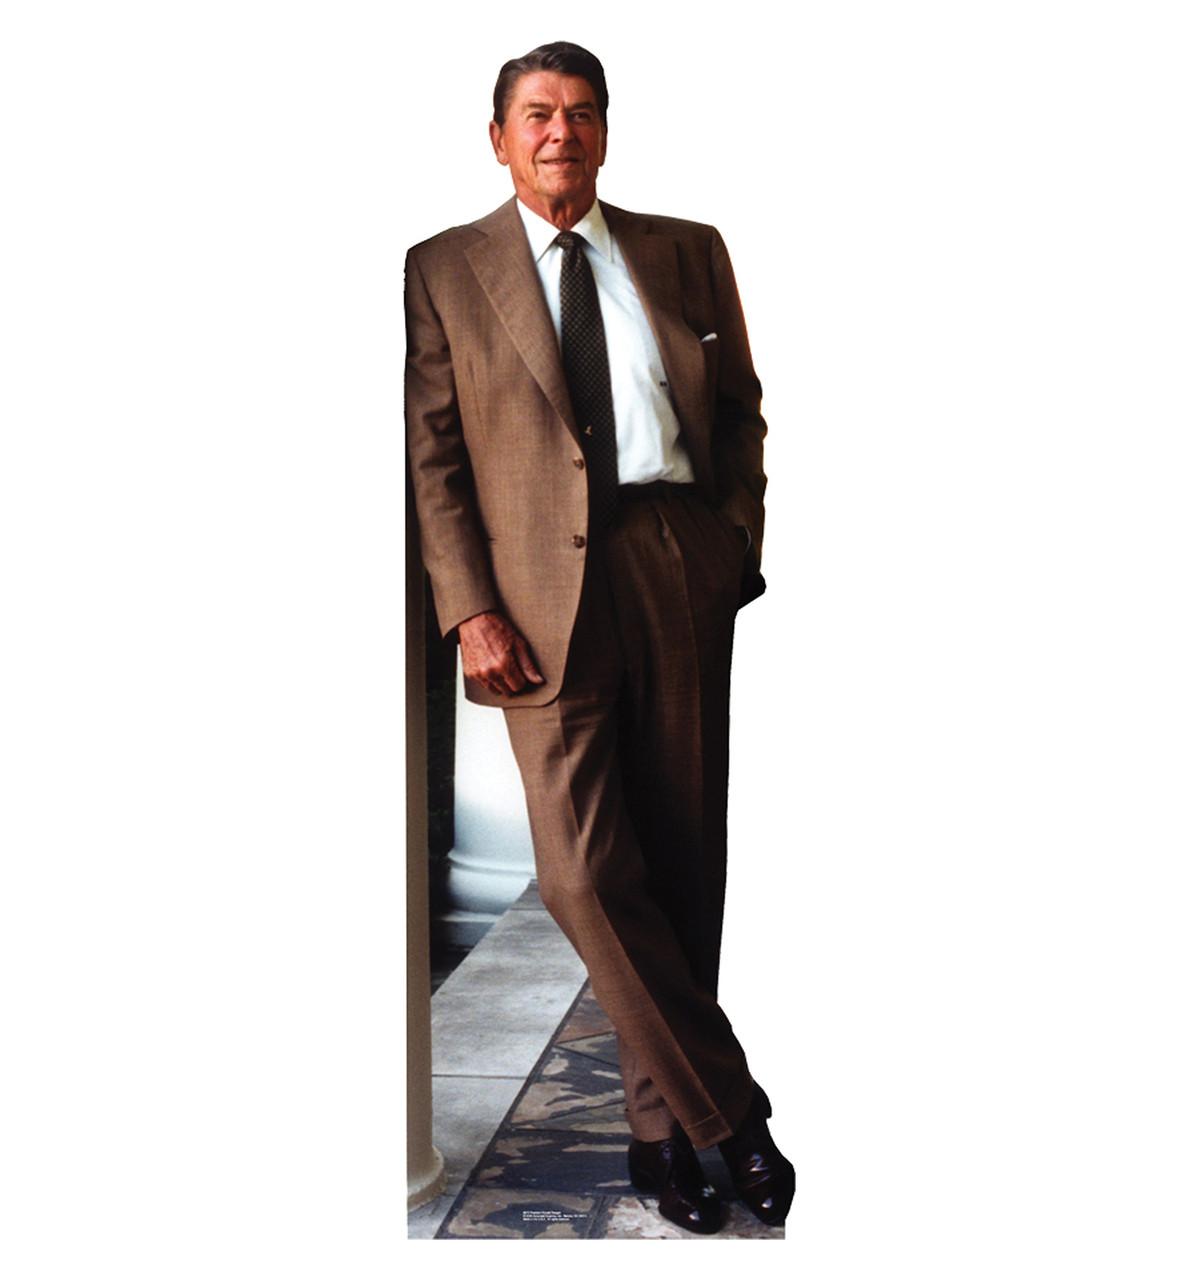 Pres. Ronald Reagan - Cardboard Cutout